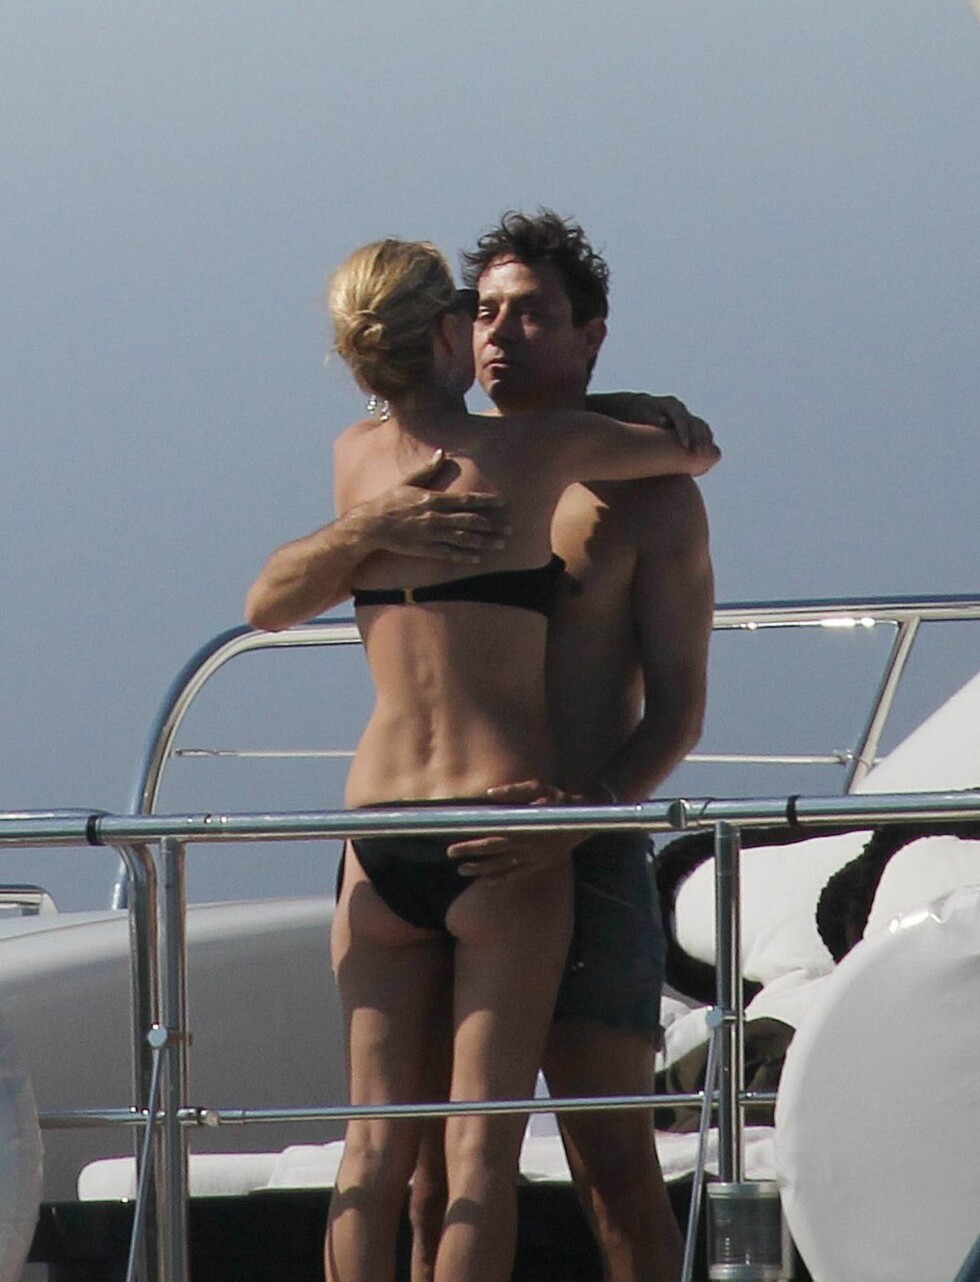 FORELSKET: Kate Moss og Jamie Hince var aldri langt fra hverandre under båtturen på sin bryllupsreise. Foto: All Over Press